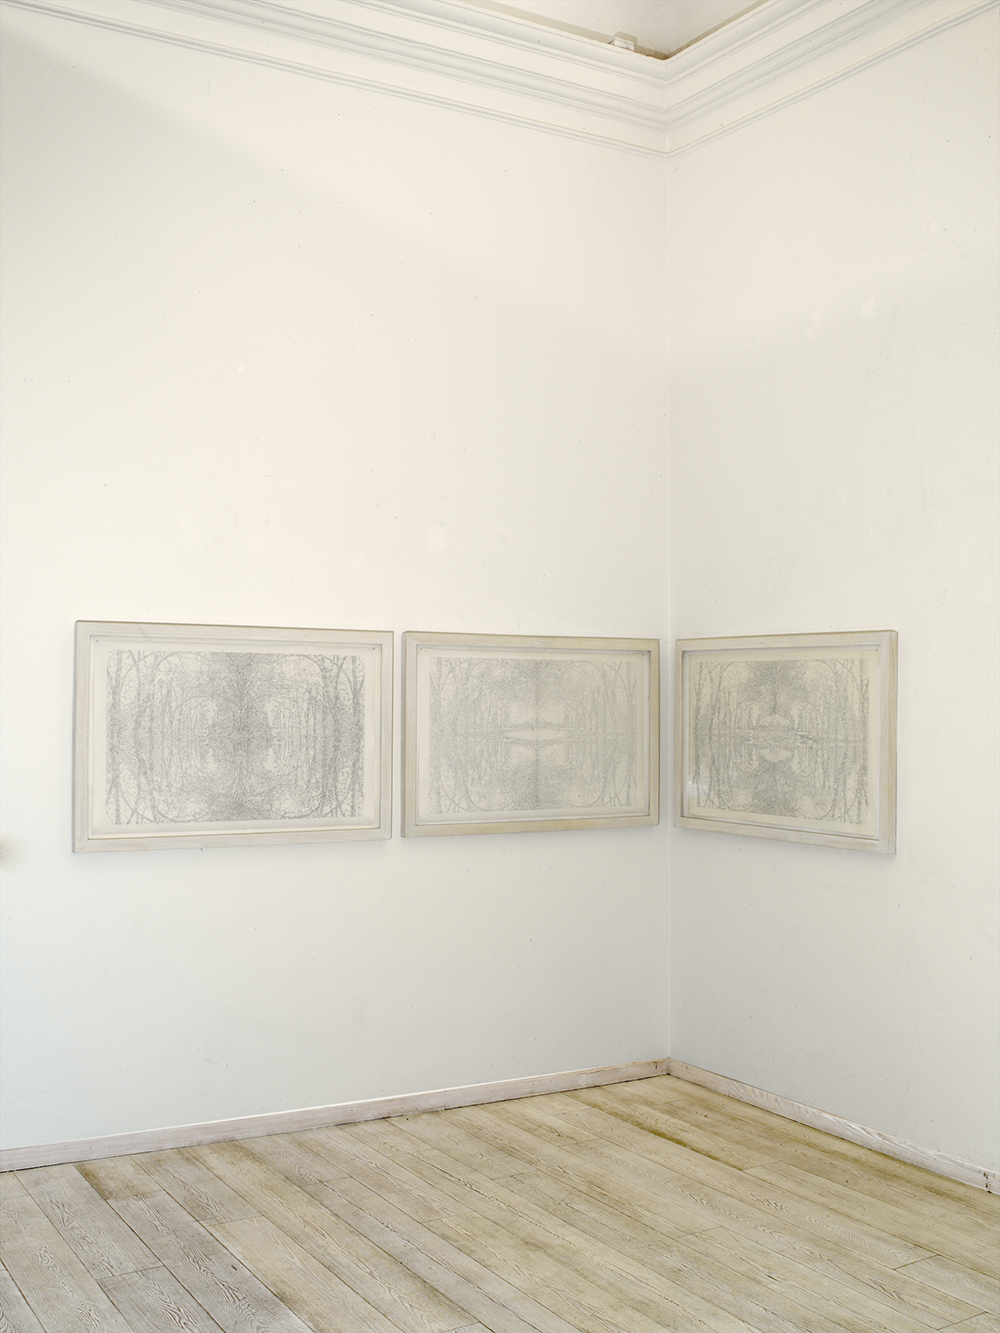 sala III - Boschi, 2003-2005, matita su carta, cm 70x120